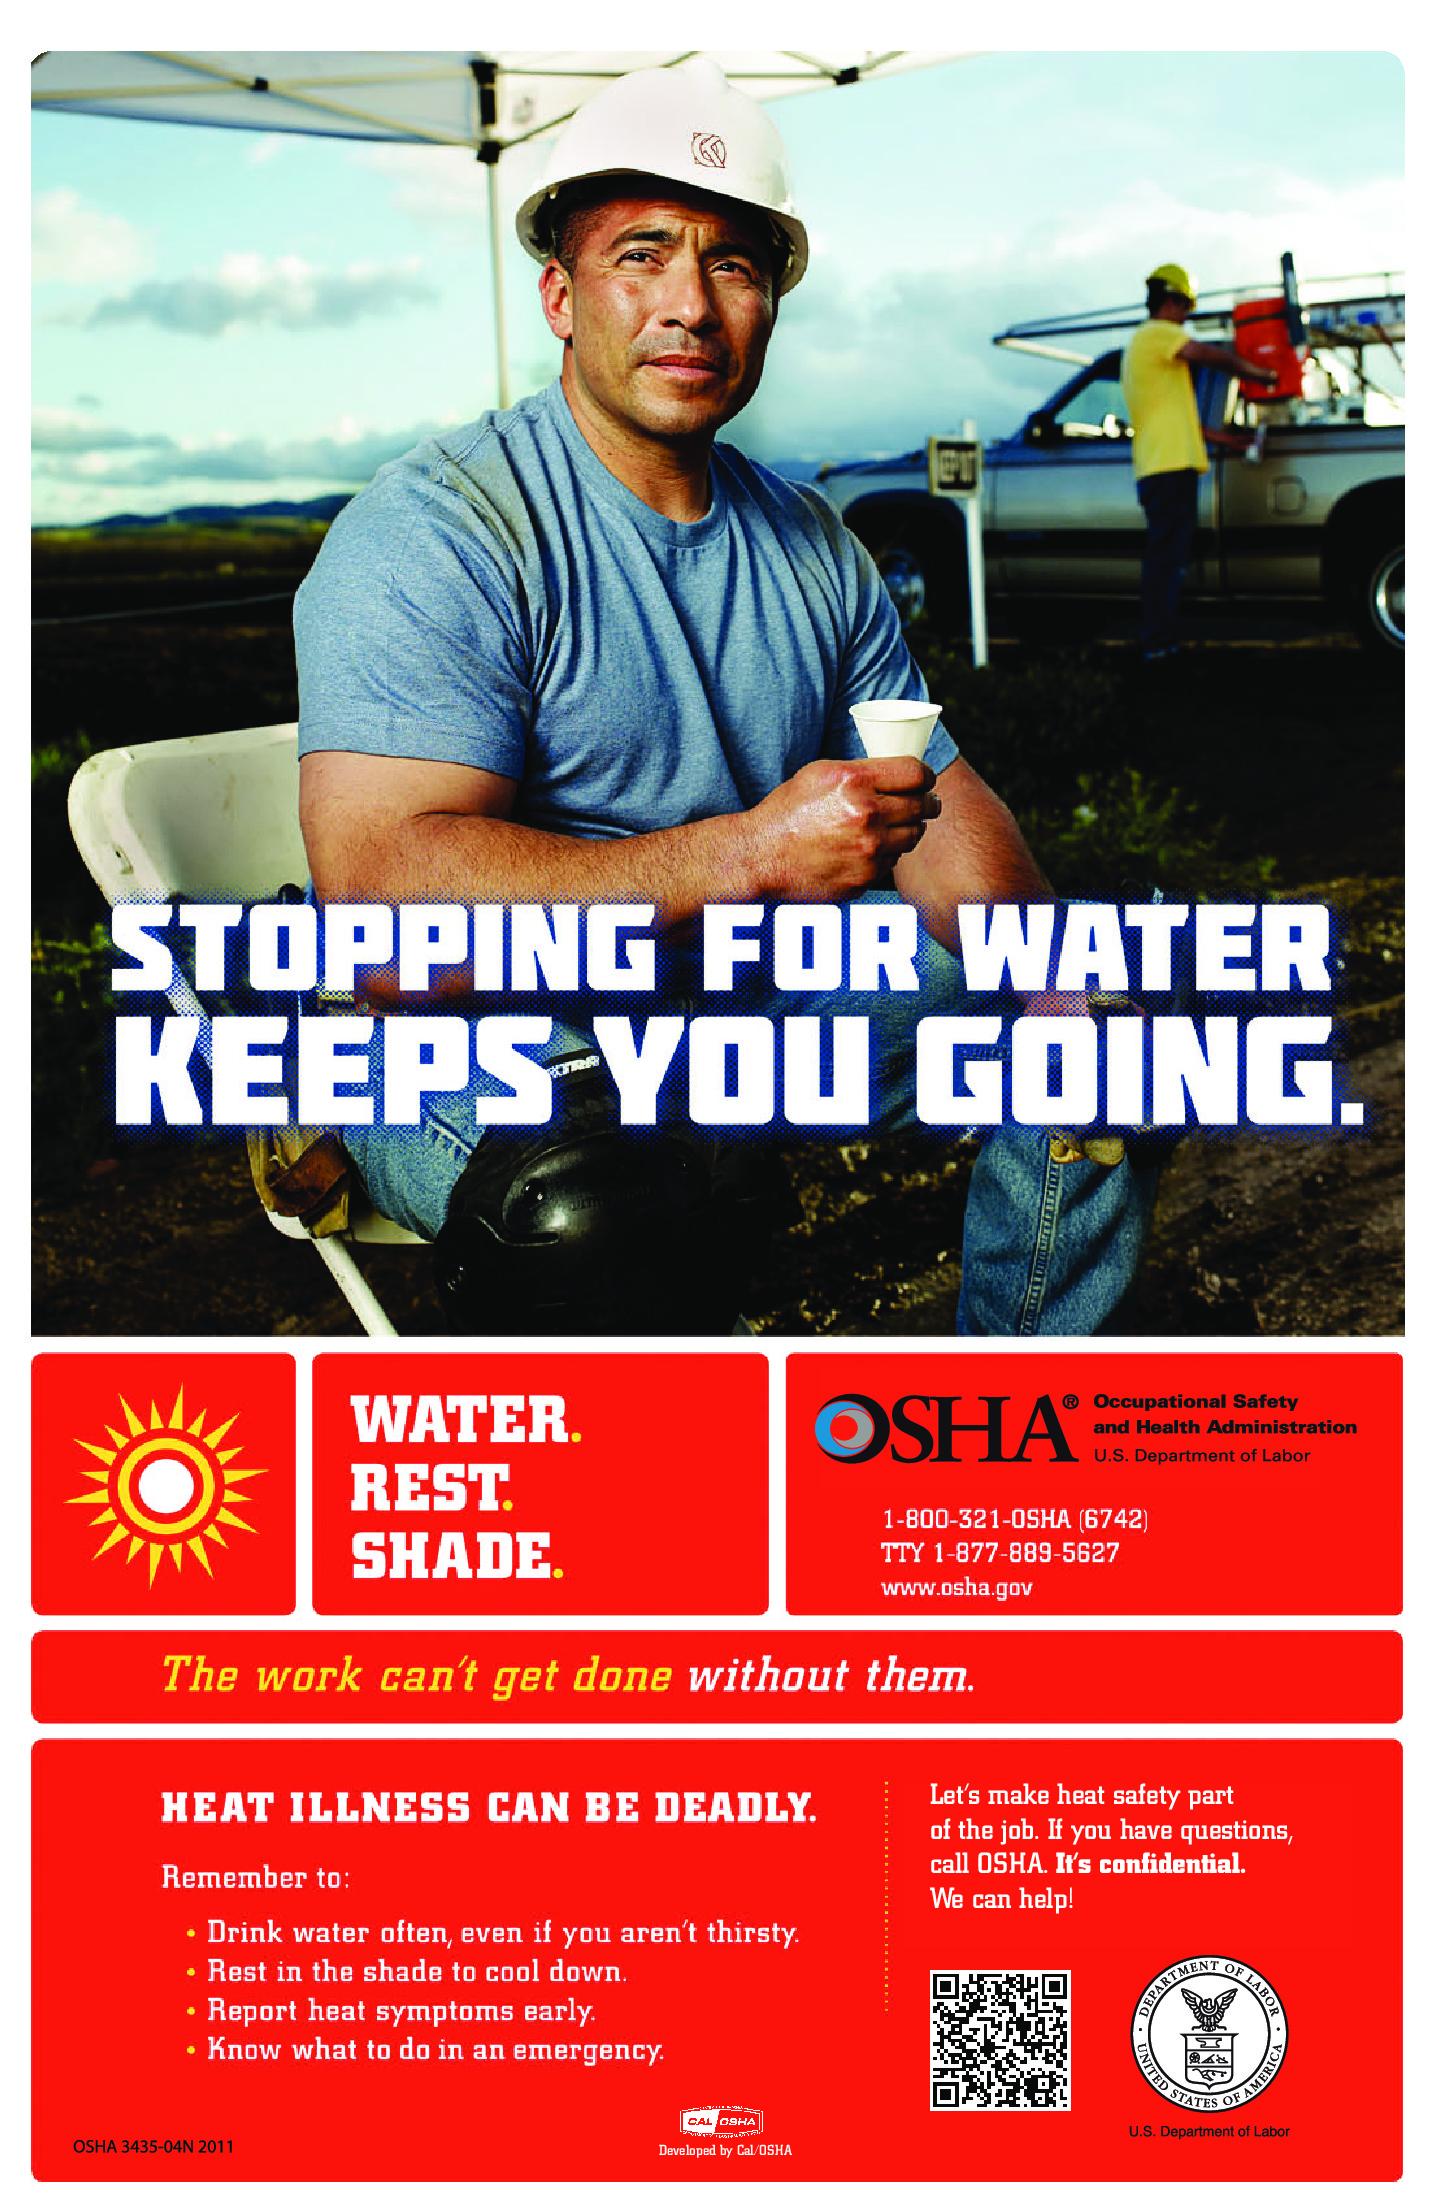 osha heat illness water poster